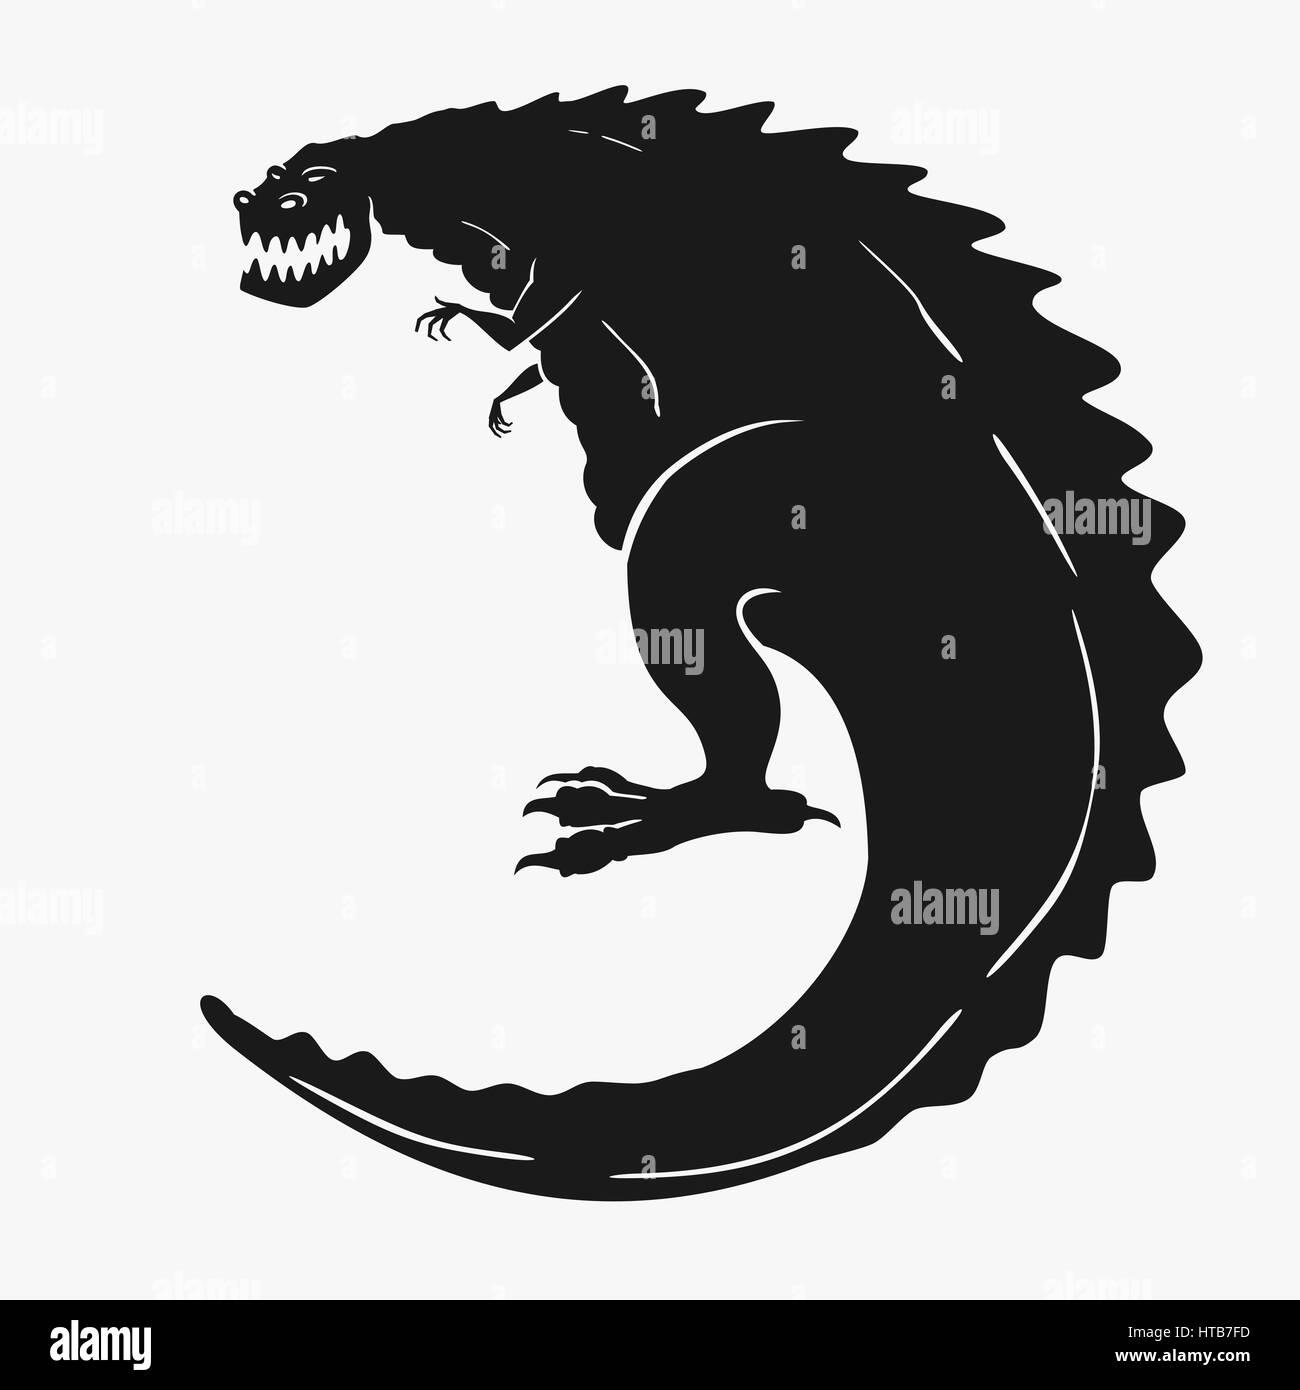 Vector Illustration of a dinosaur monster - Stock Image